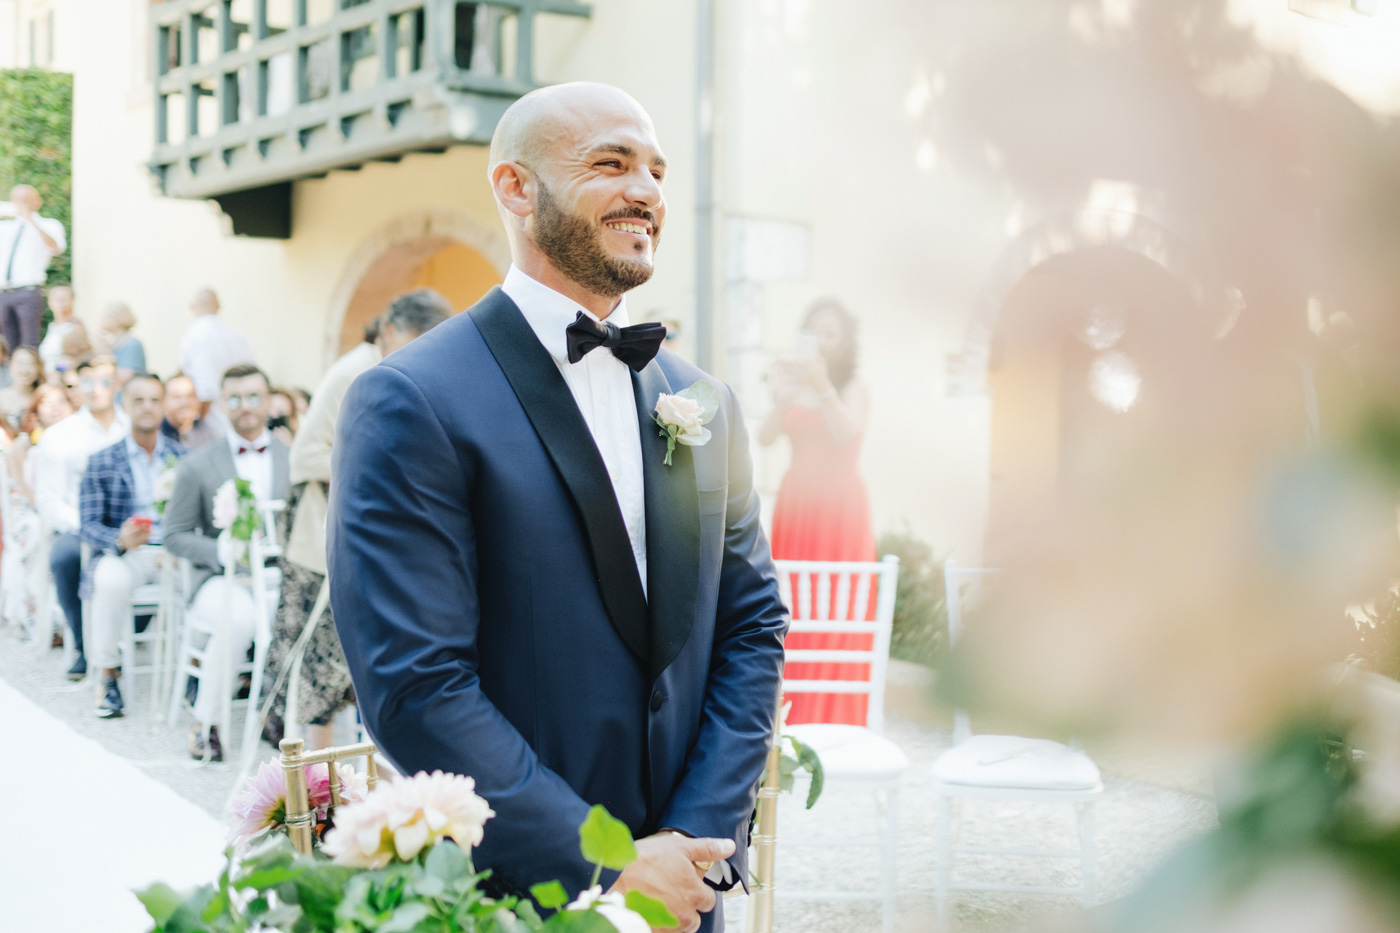 Matrimoni all'italiana wedding photographer italy-49.jpg